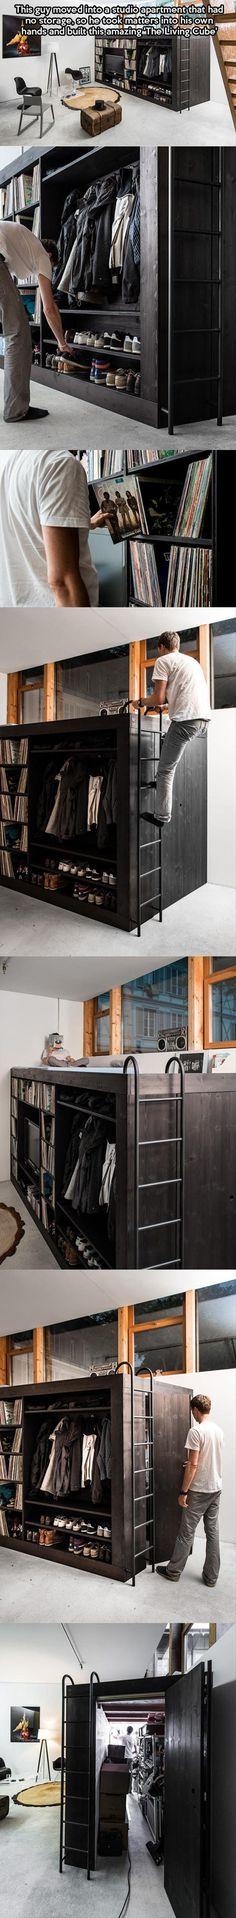 freestanding storage/bed/desk unit for renters. Simple Ideas That Are Borderline Genius – 20 Pics